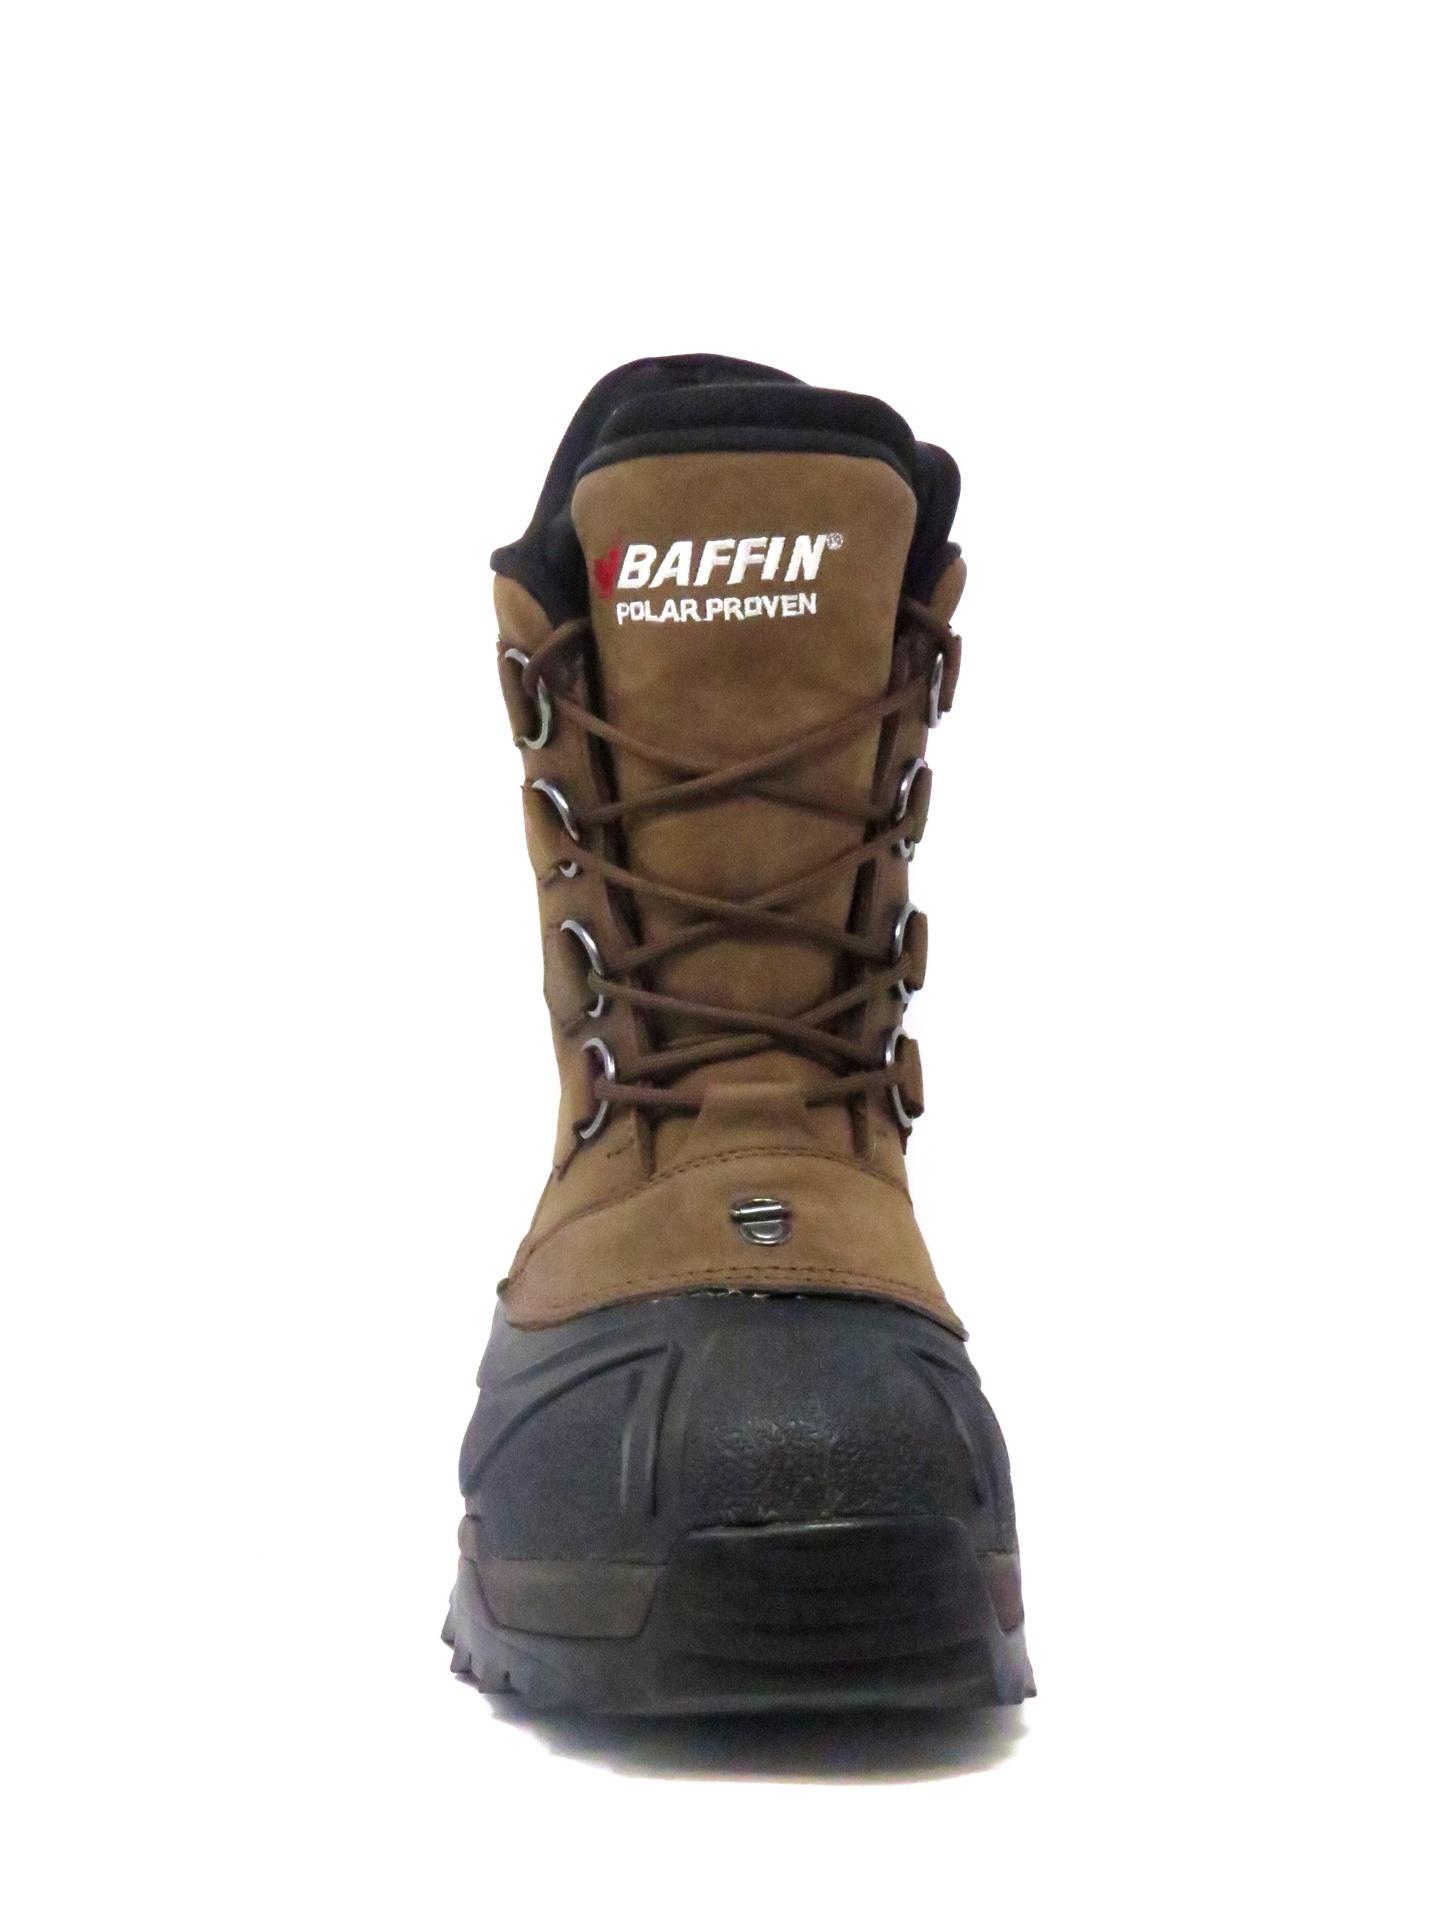 b681238b44a Baffin   EPIC-M004   Control Max   Worn Brown